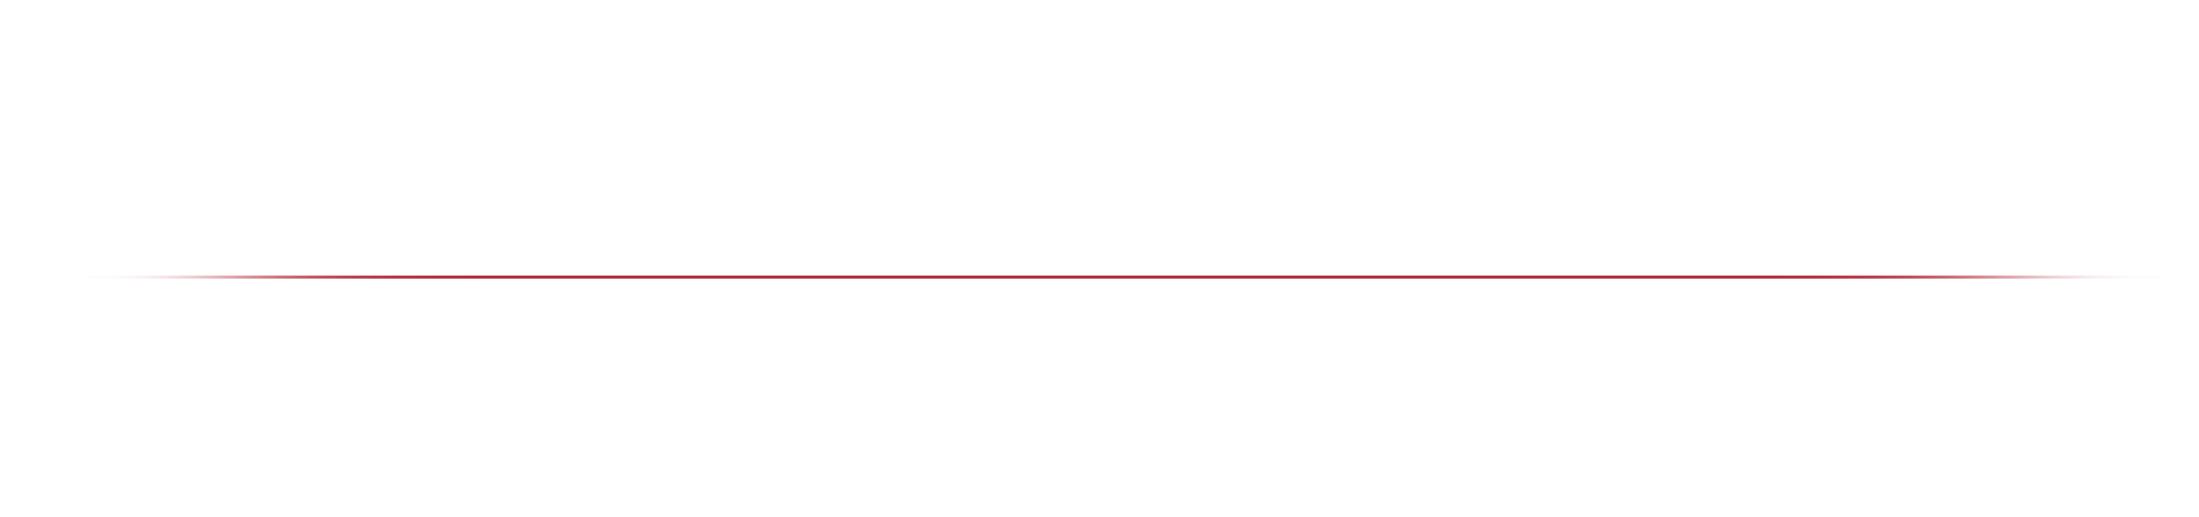 underline - הגרנולה של תימור